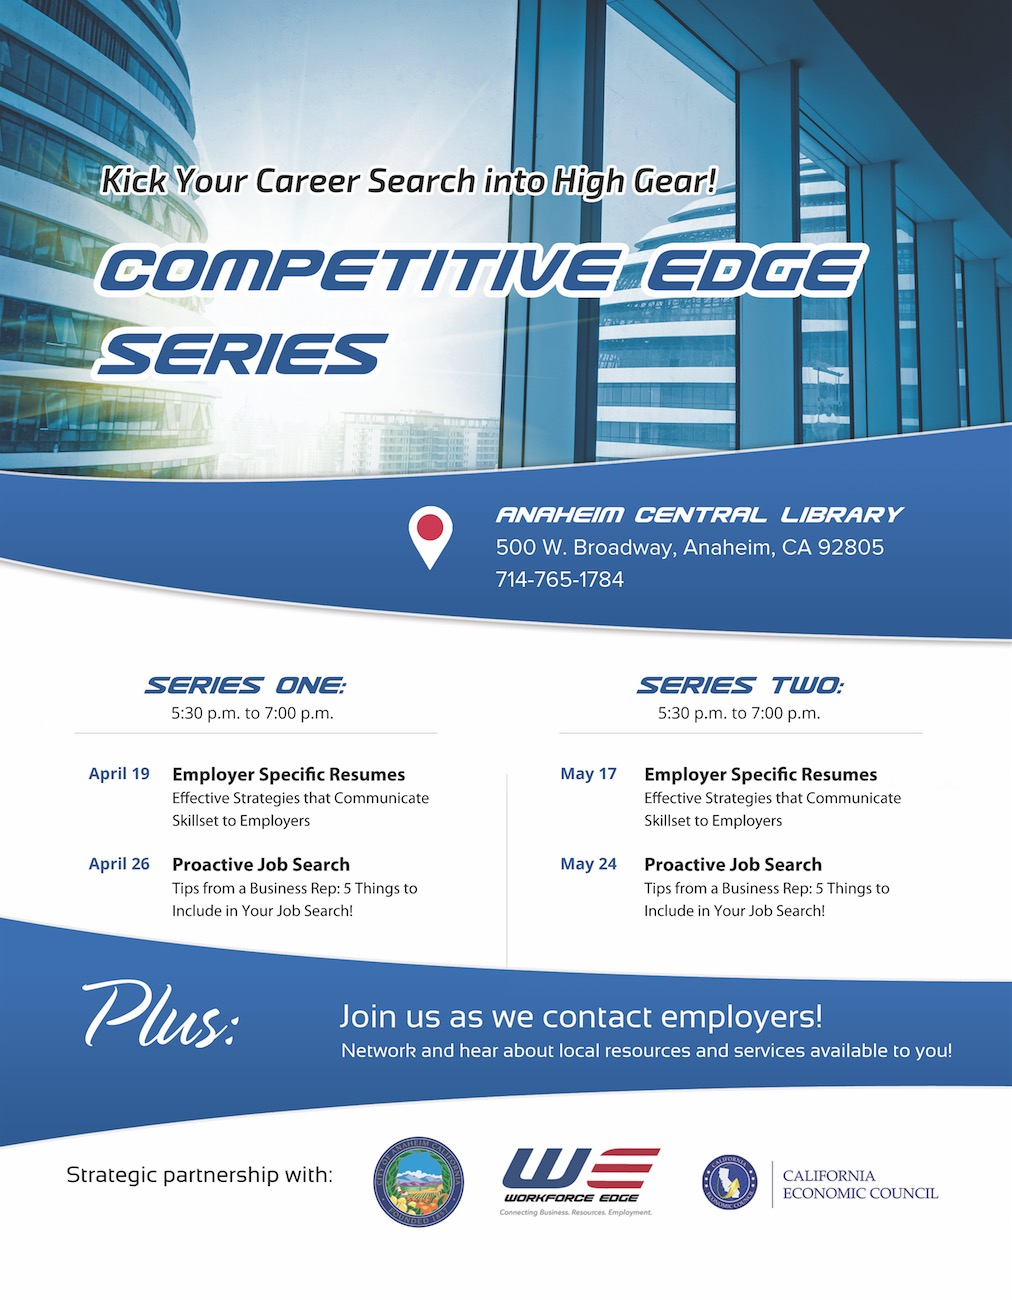 Competitive Edge Workshop Series